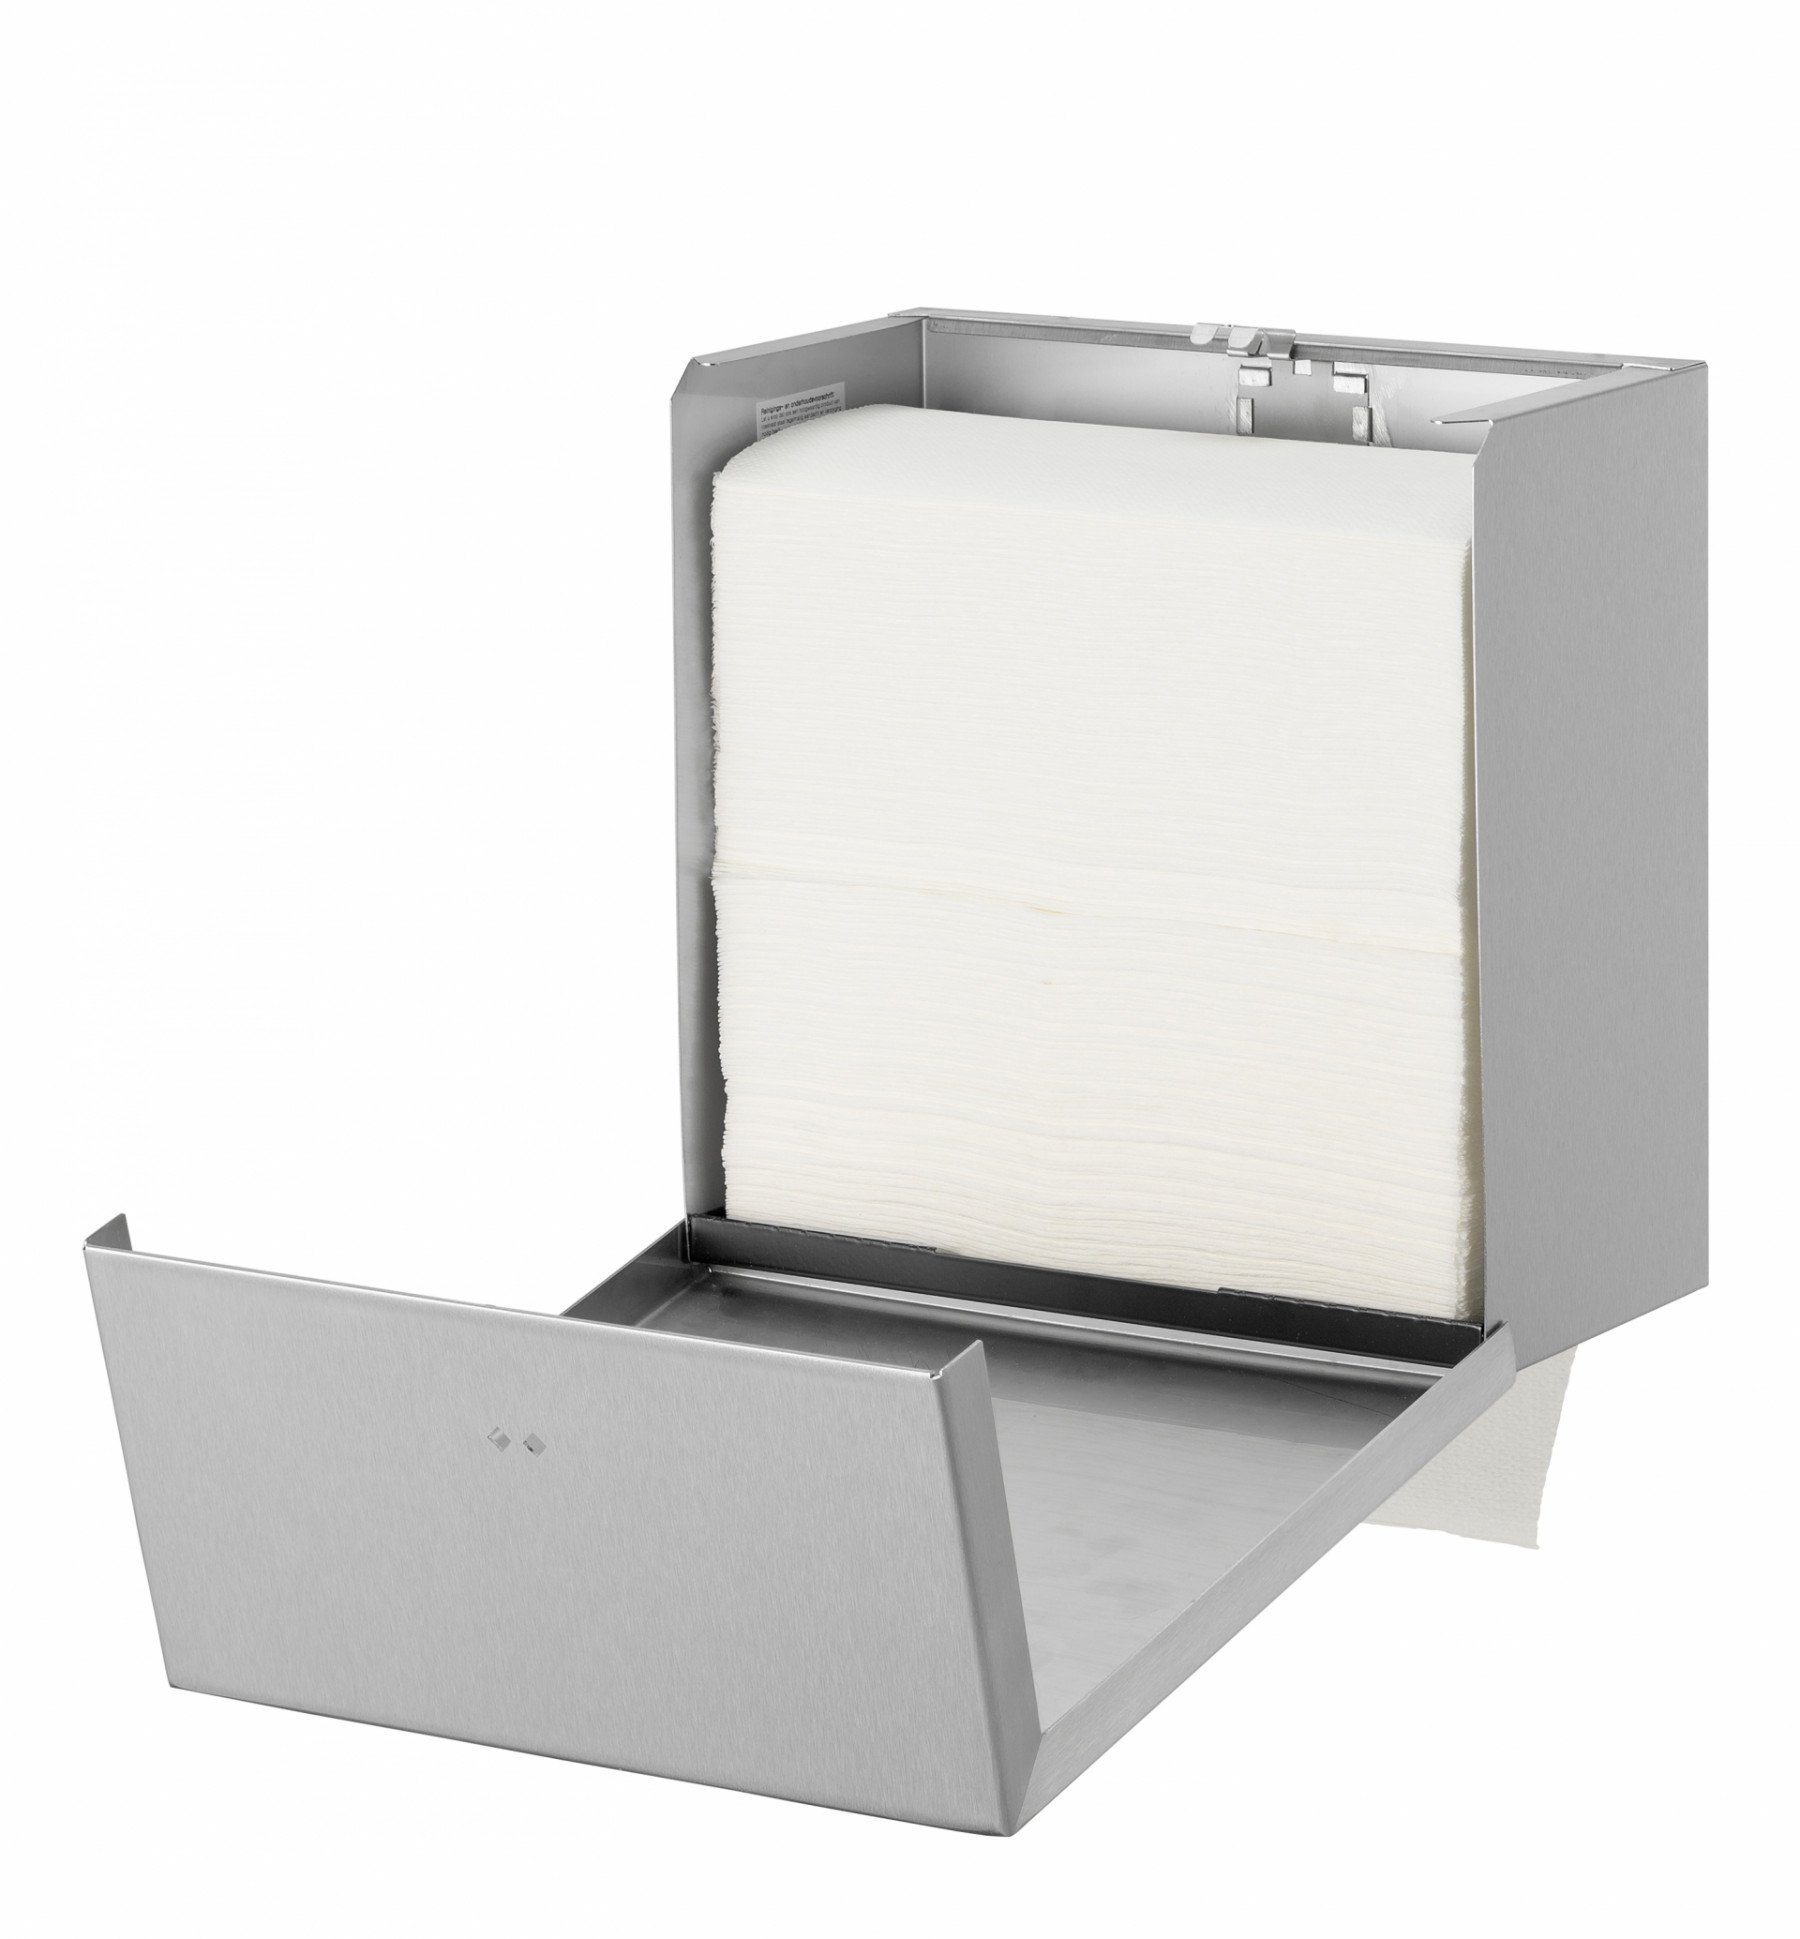 Qbicline | Handdoek dispenser | RVS